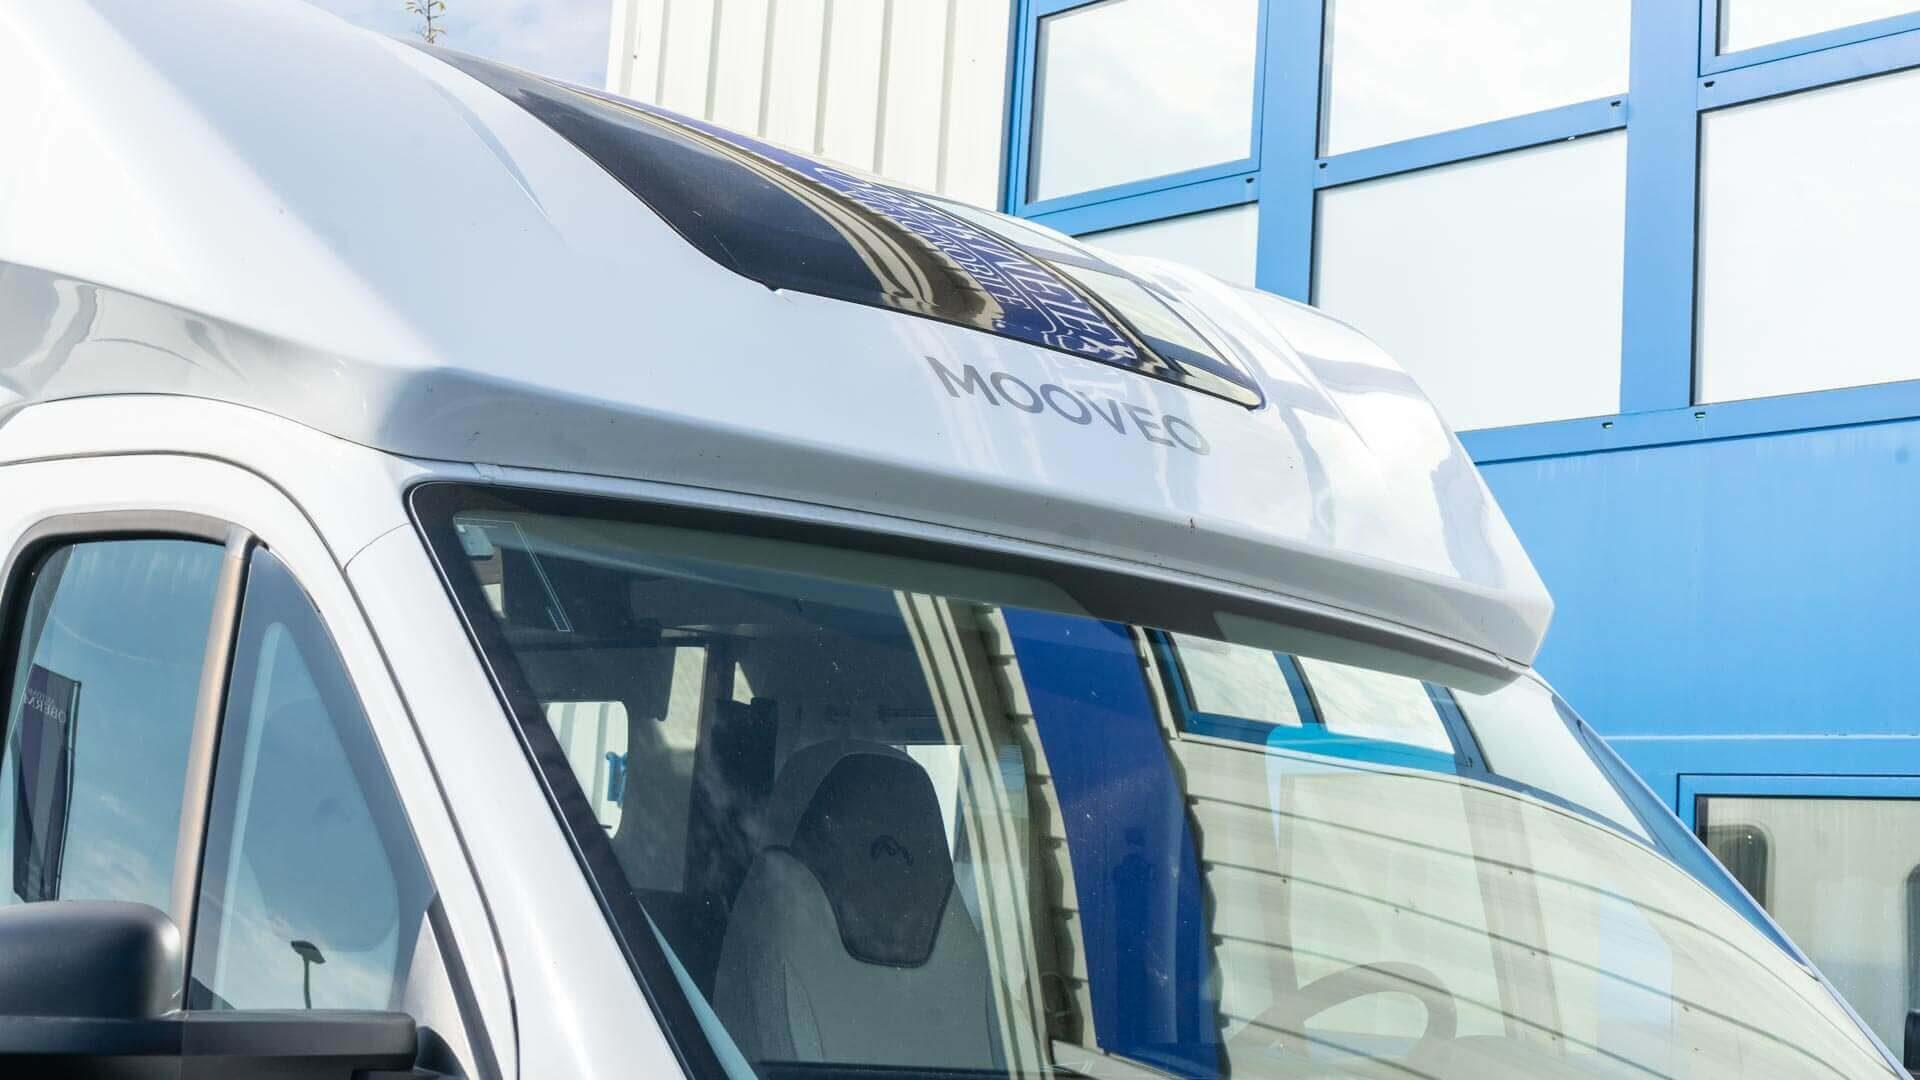 Mooveo-Wohnmobil bei Automobile Obermeier in Meckenheim